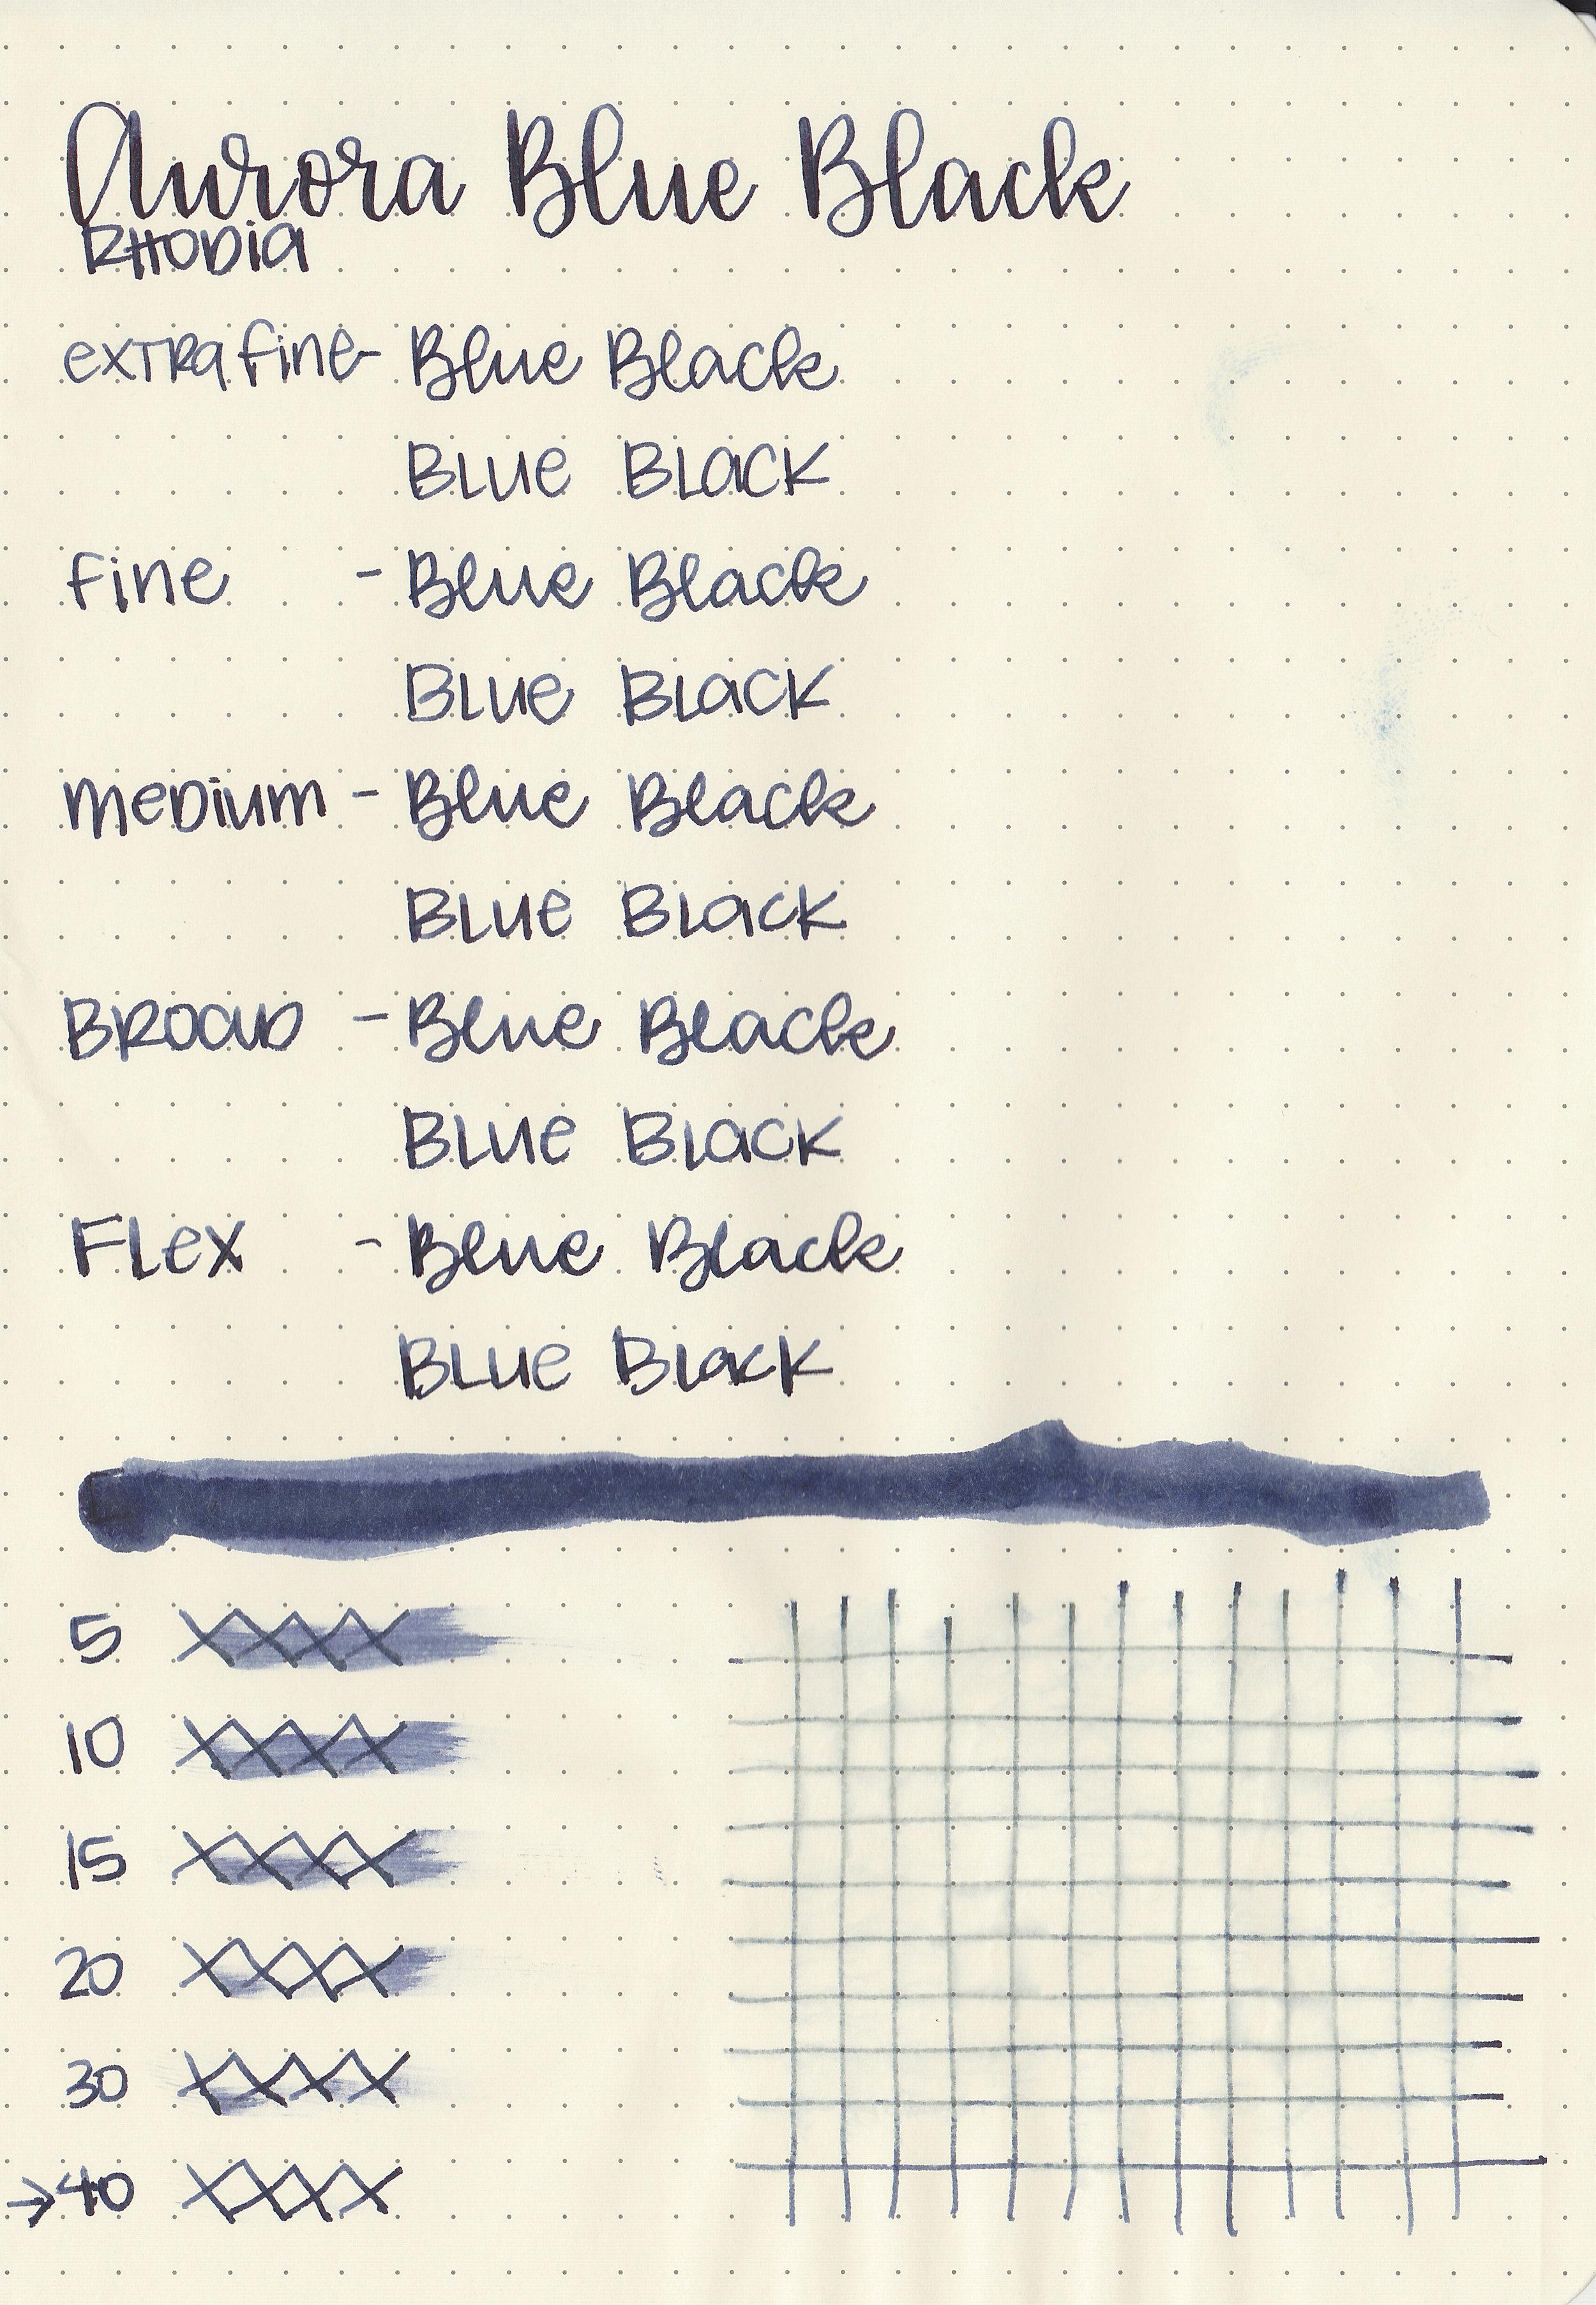 ar-blue-black-5.jpg